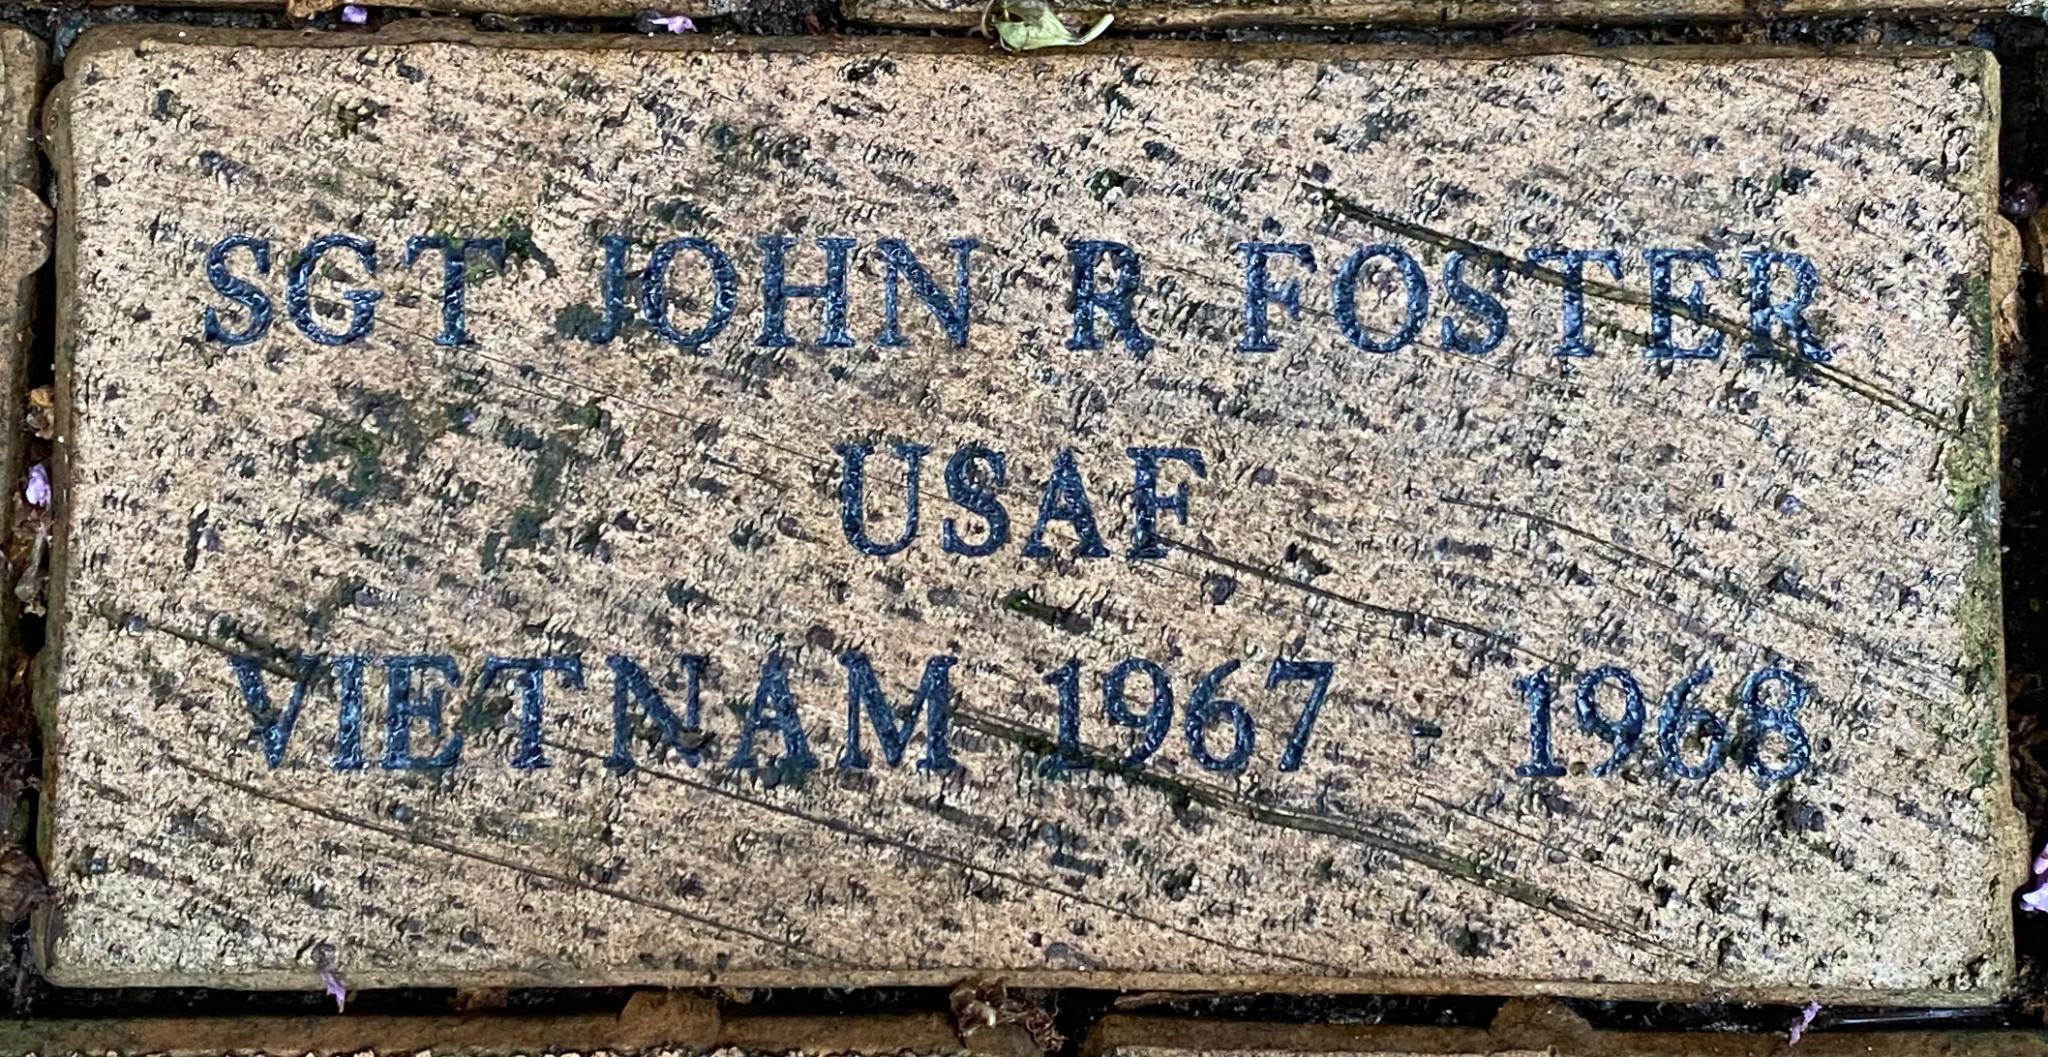 SGT JOHN R FOSTER USAF VIETNAM 1967 – 1968